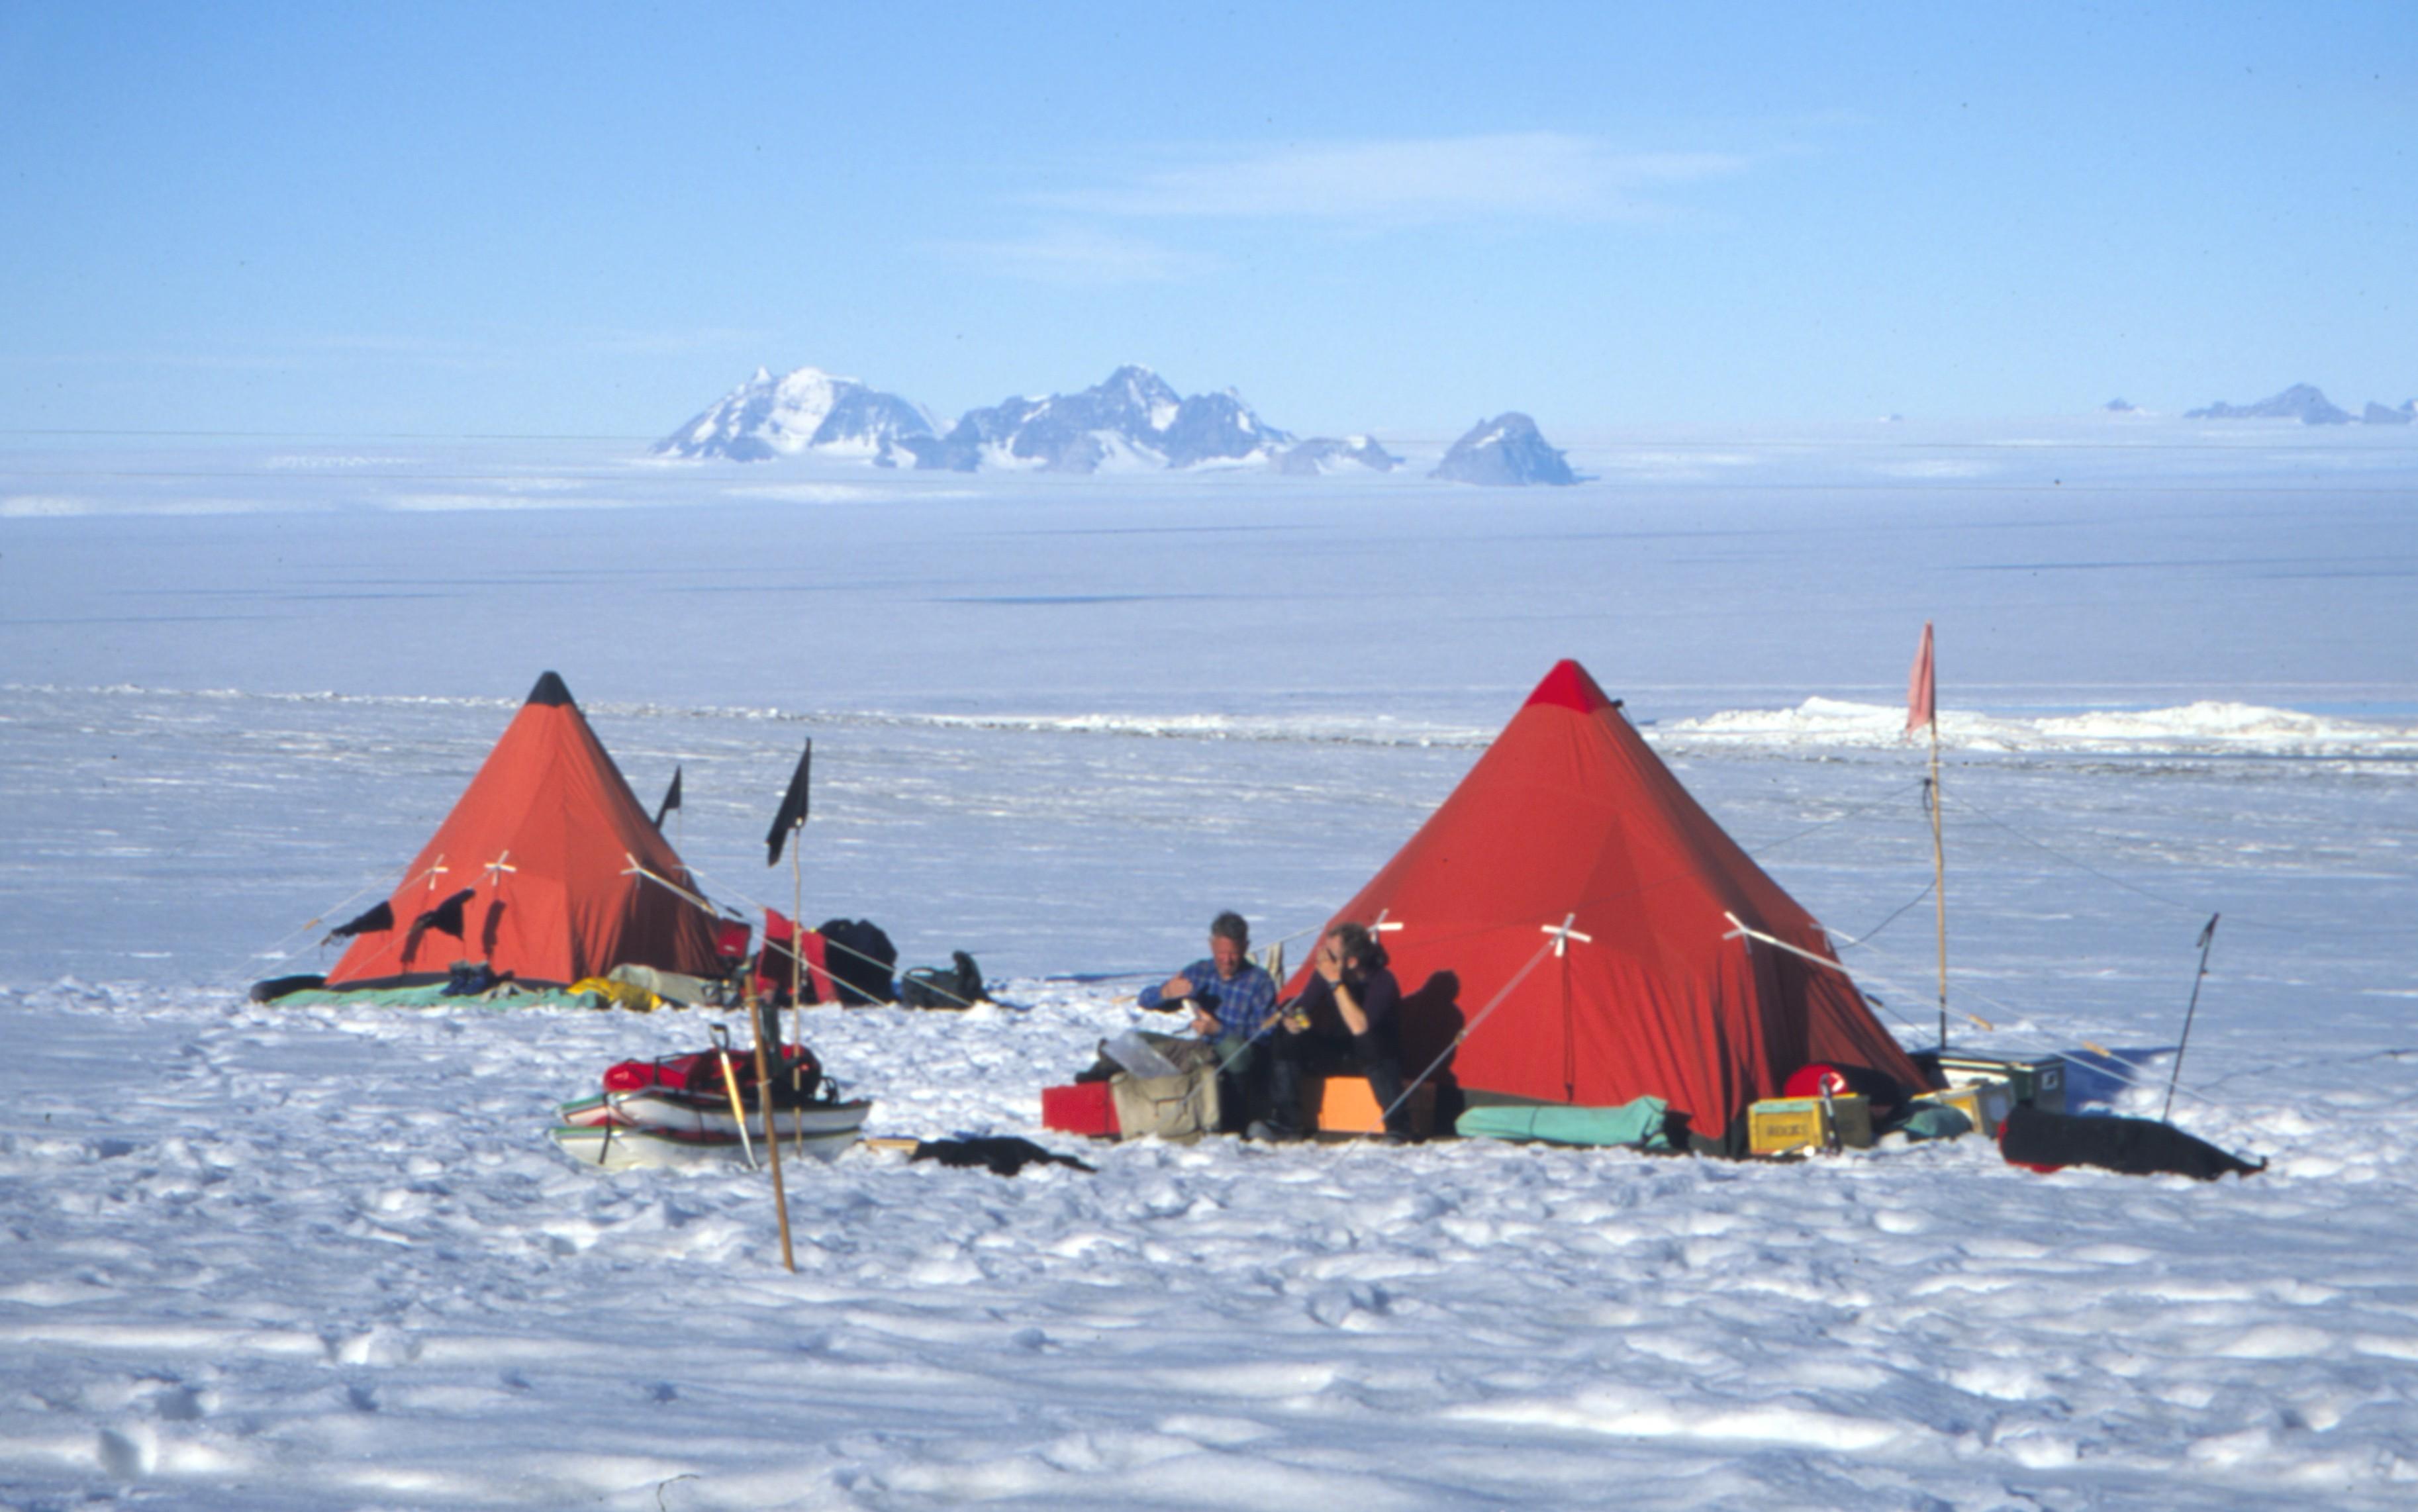 Alexander Island Antarctica DX News VP8DMH/P